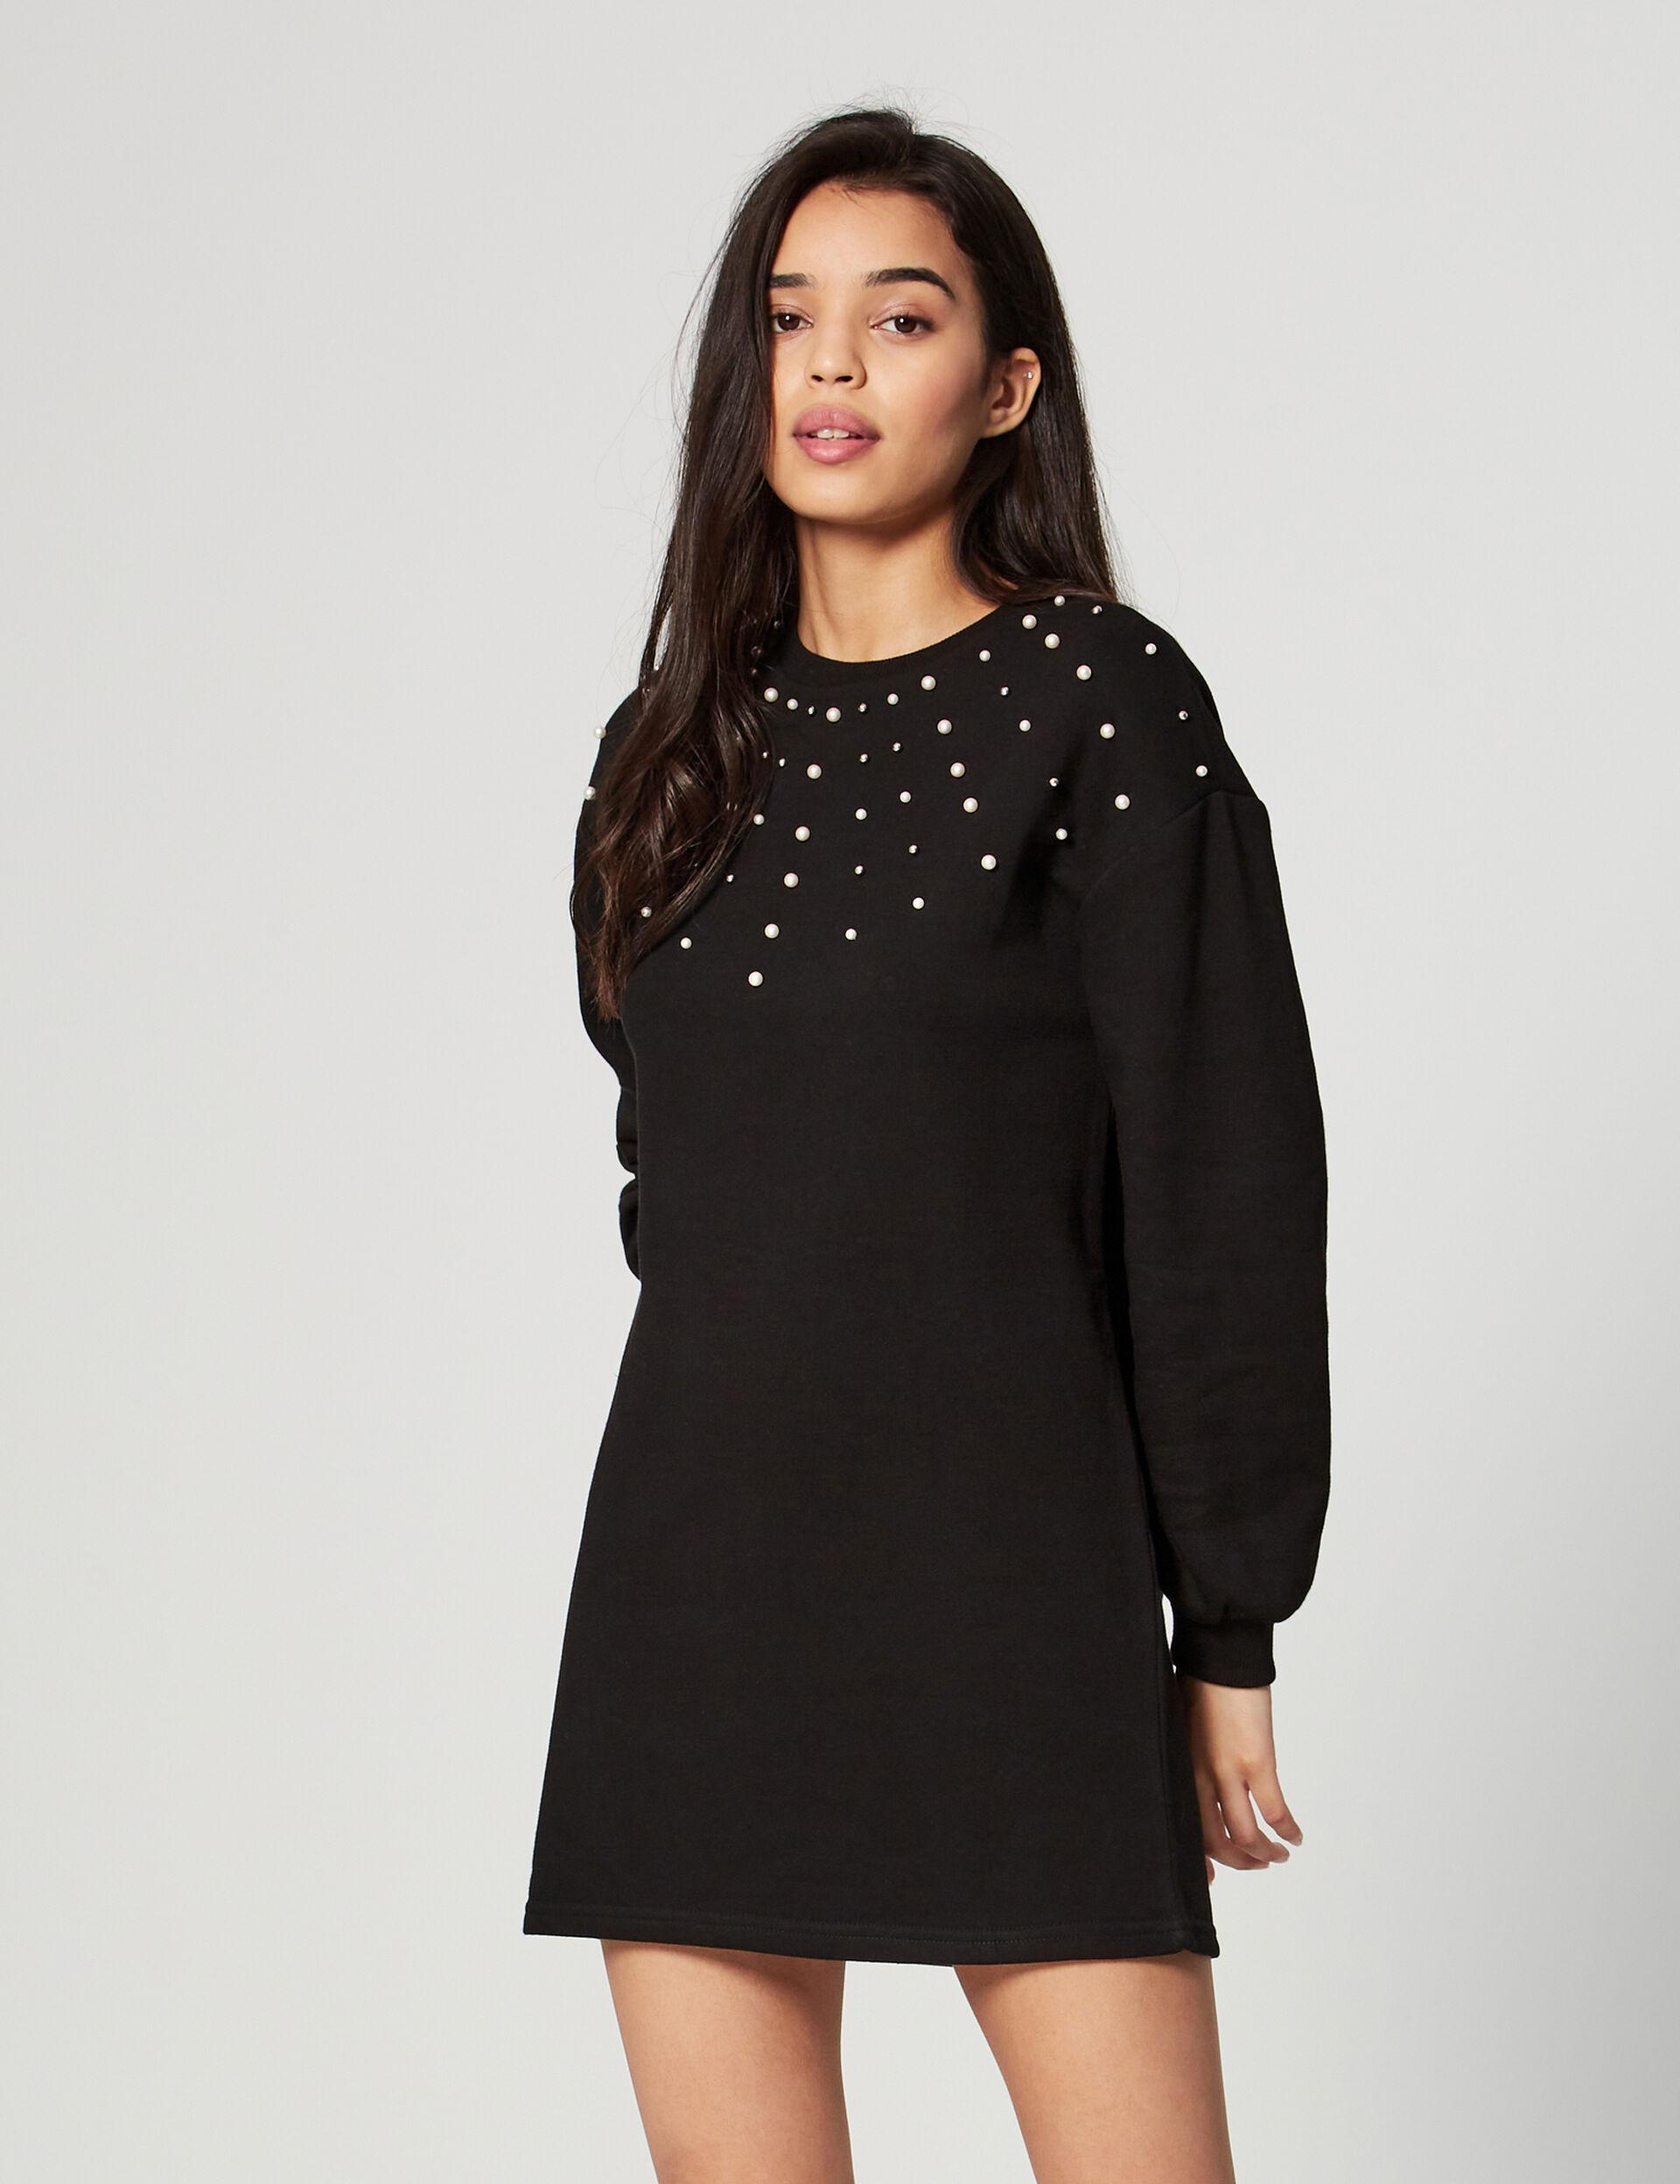 Beaded jumper dress